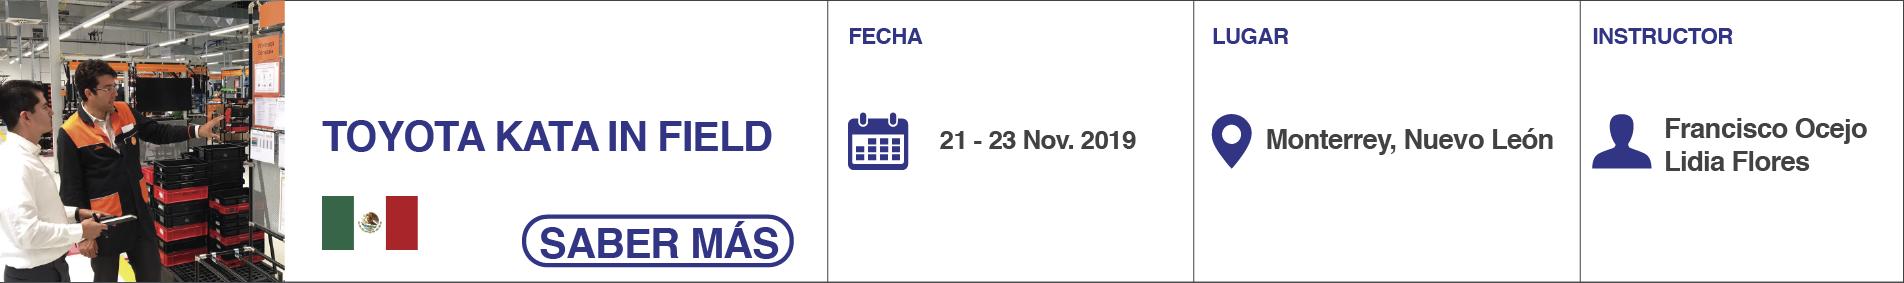 calendar-alfra-1-06